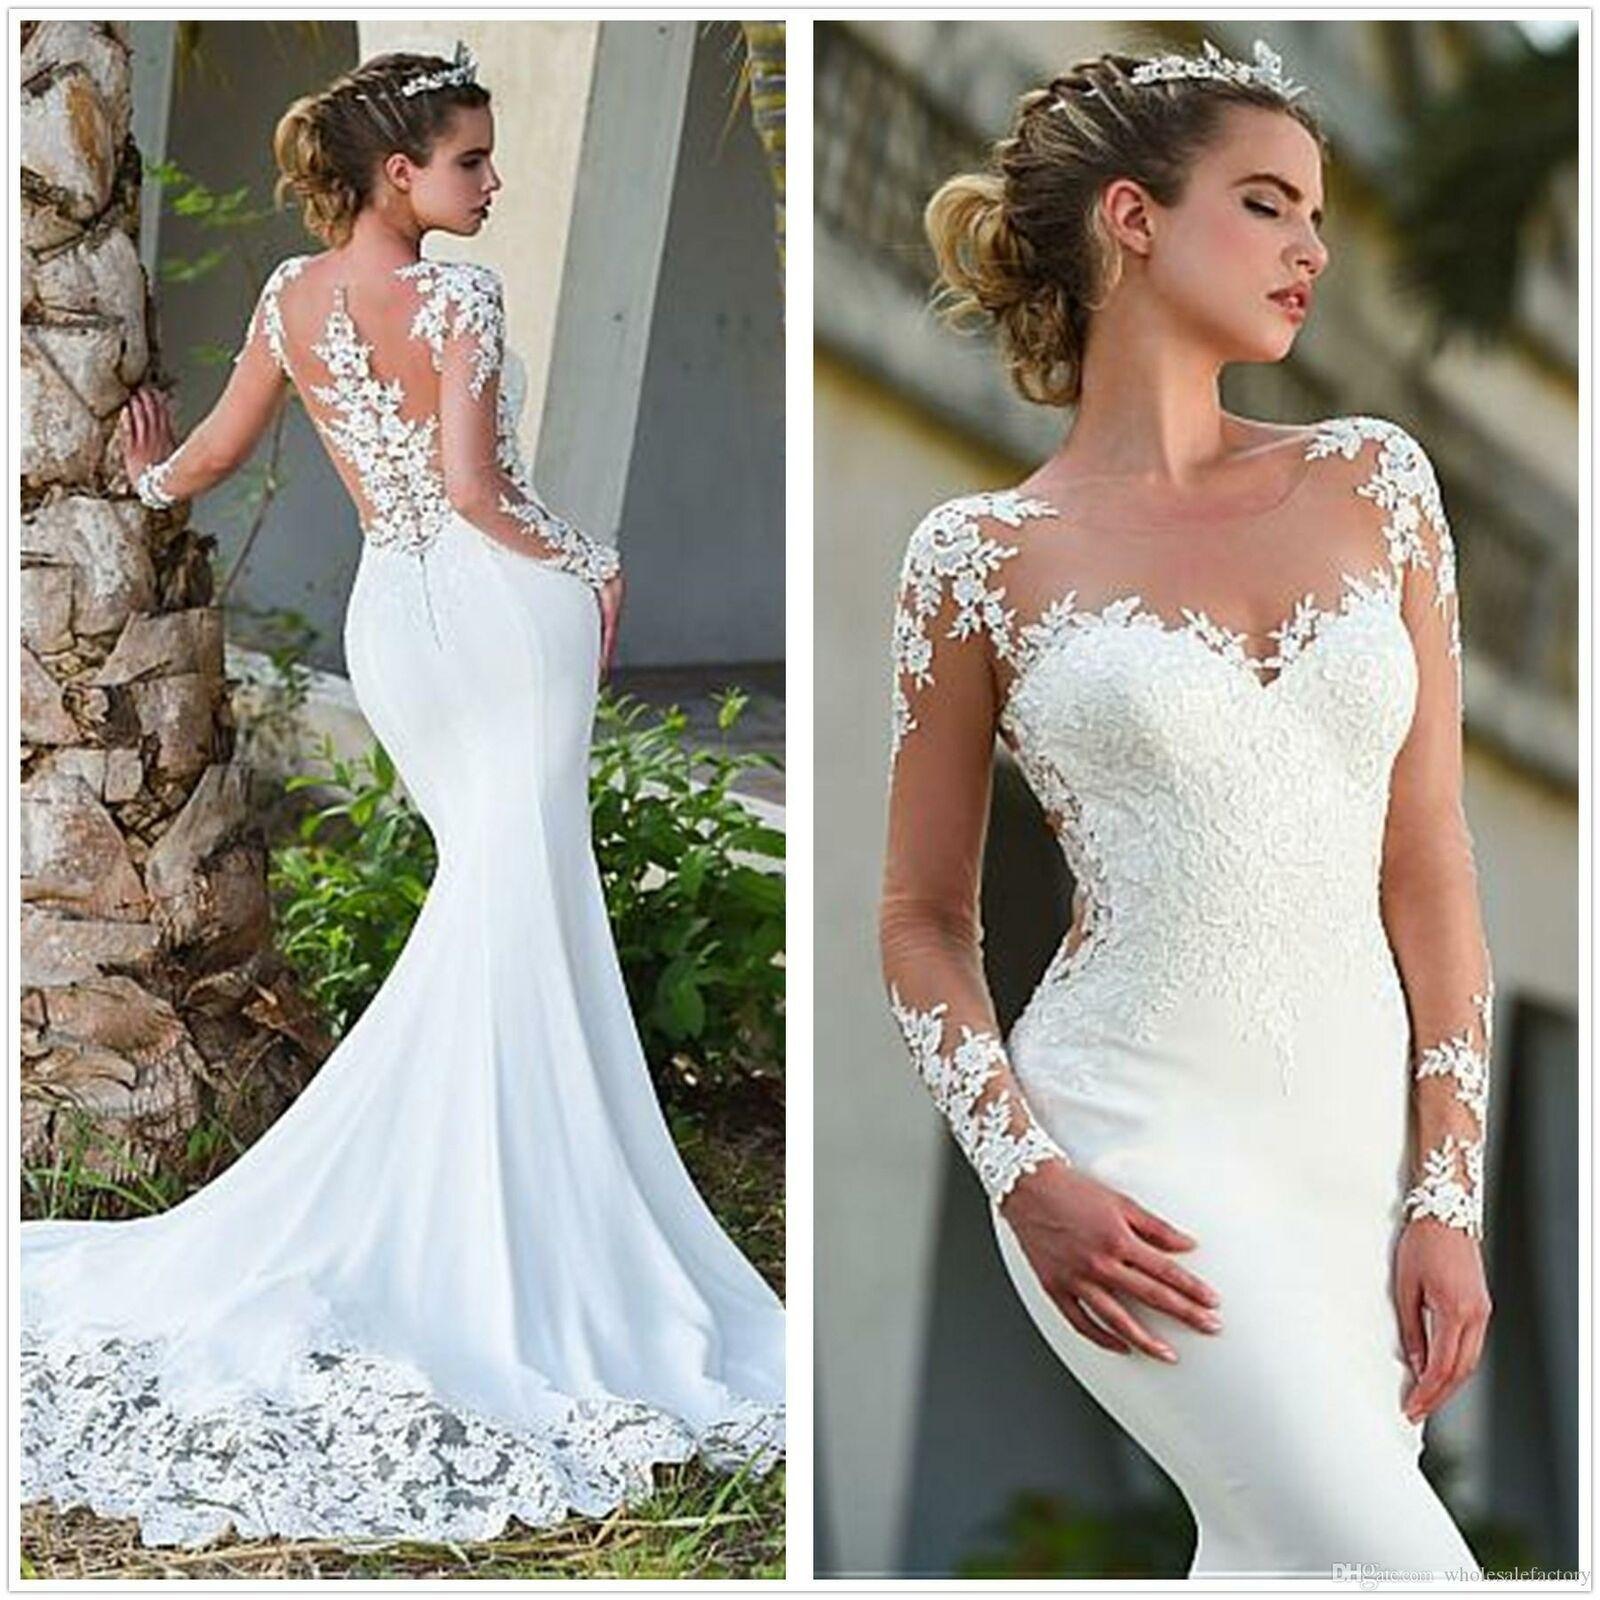 Long Sleeves Satin Mermaid Wedding Dress 2020 Tulle Lace Applique Bridal Gown Wed Sheer Wedding Dress Lace Mermaid Wedding Dress Satin Mermaid Wedding Dress [ 1600 x 1600 Pixel ]